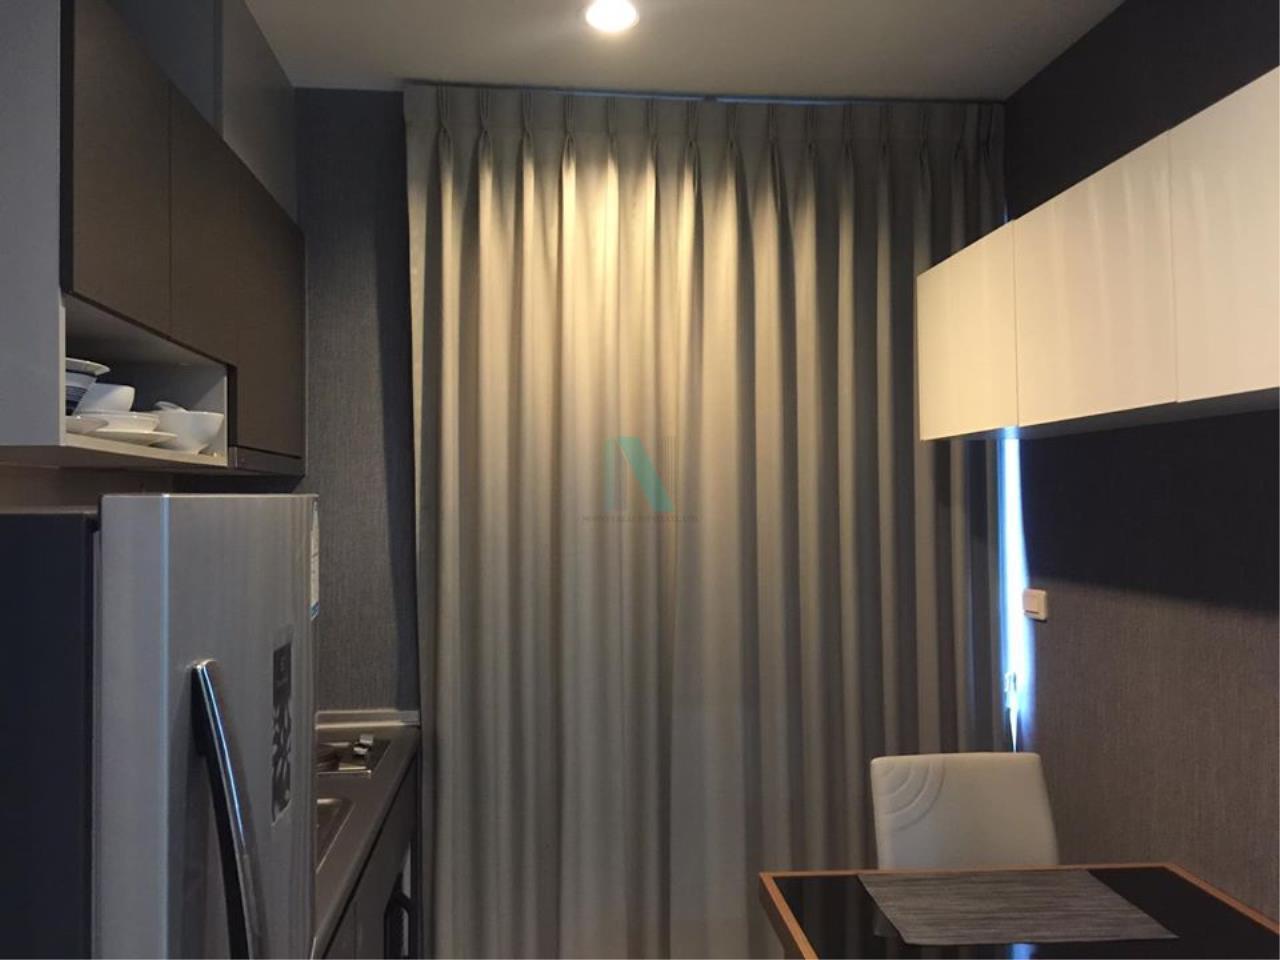 NOPPON REAL ESTATE CO.,LTD. Agency's NR09373. For Rent The Base Rama 9 - Ramkhamhaeng, 1 bedroom 28th floor near Airport Link Ramkhamhaeng. 6